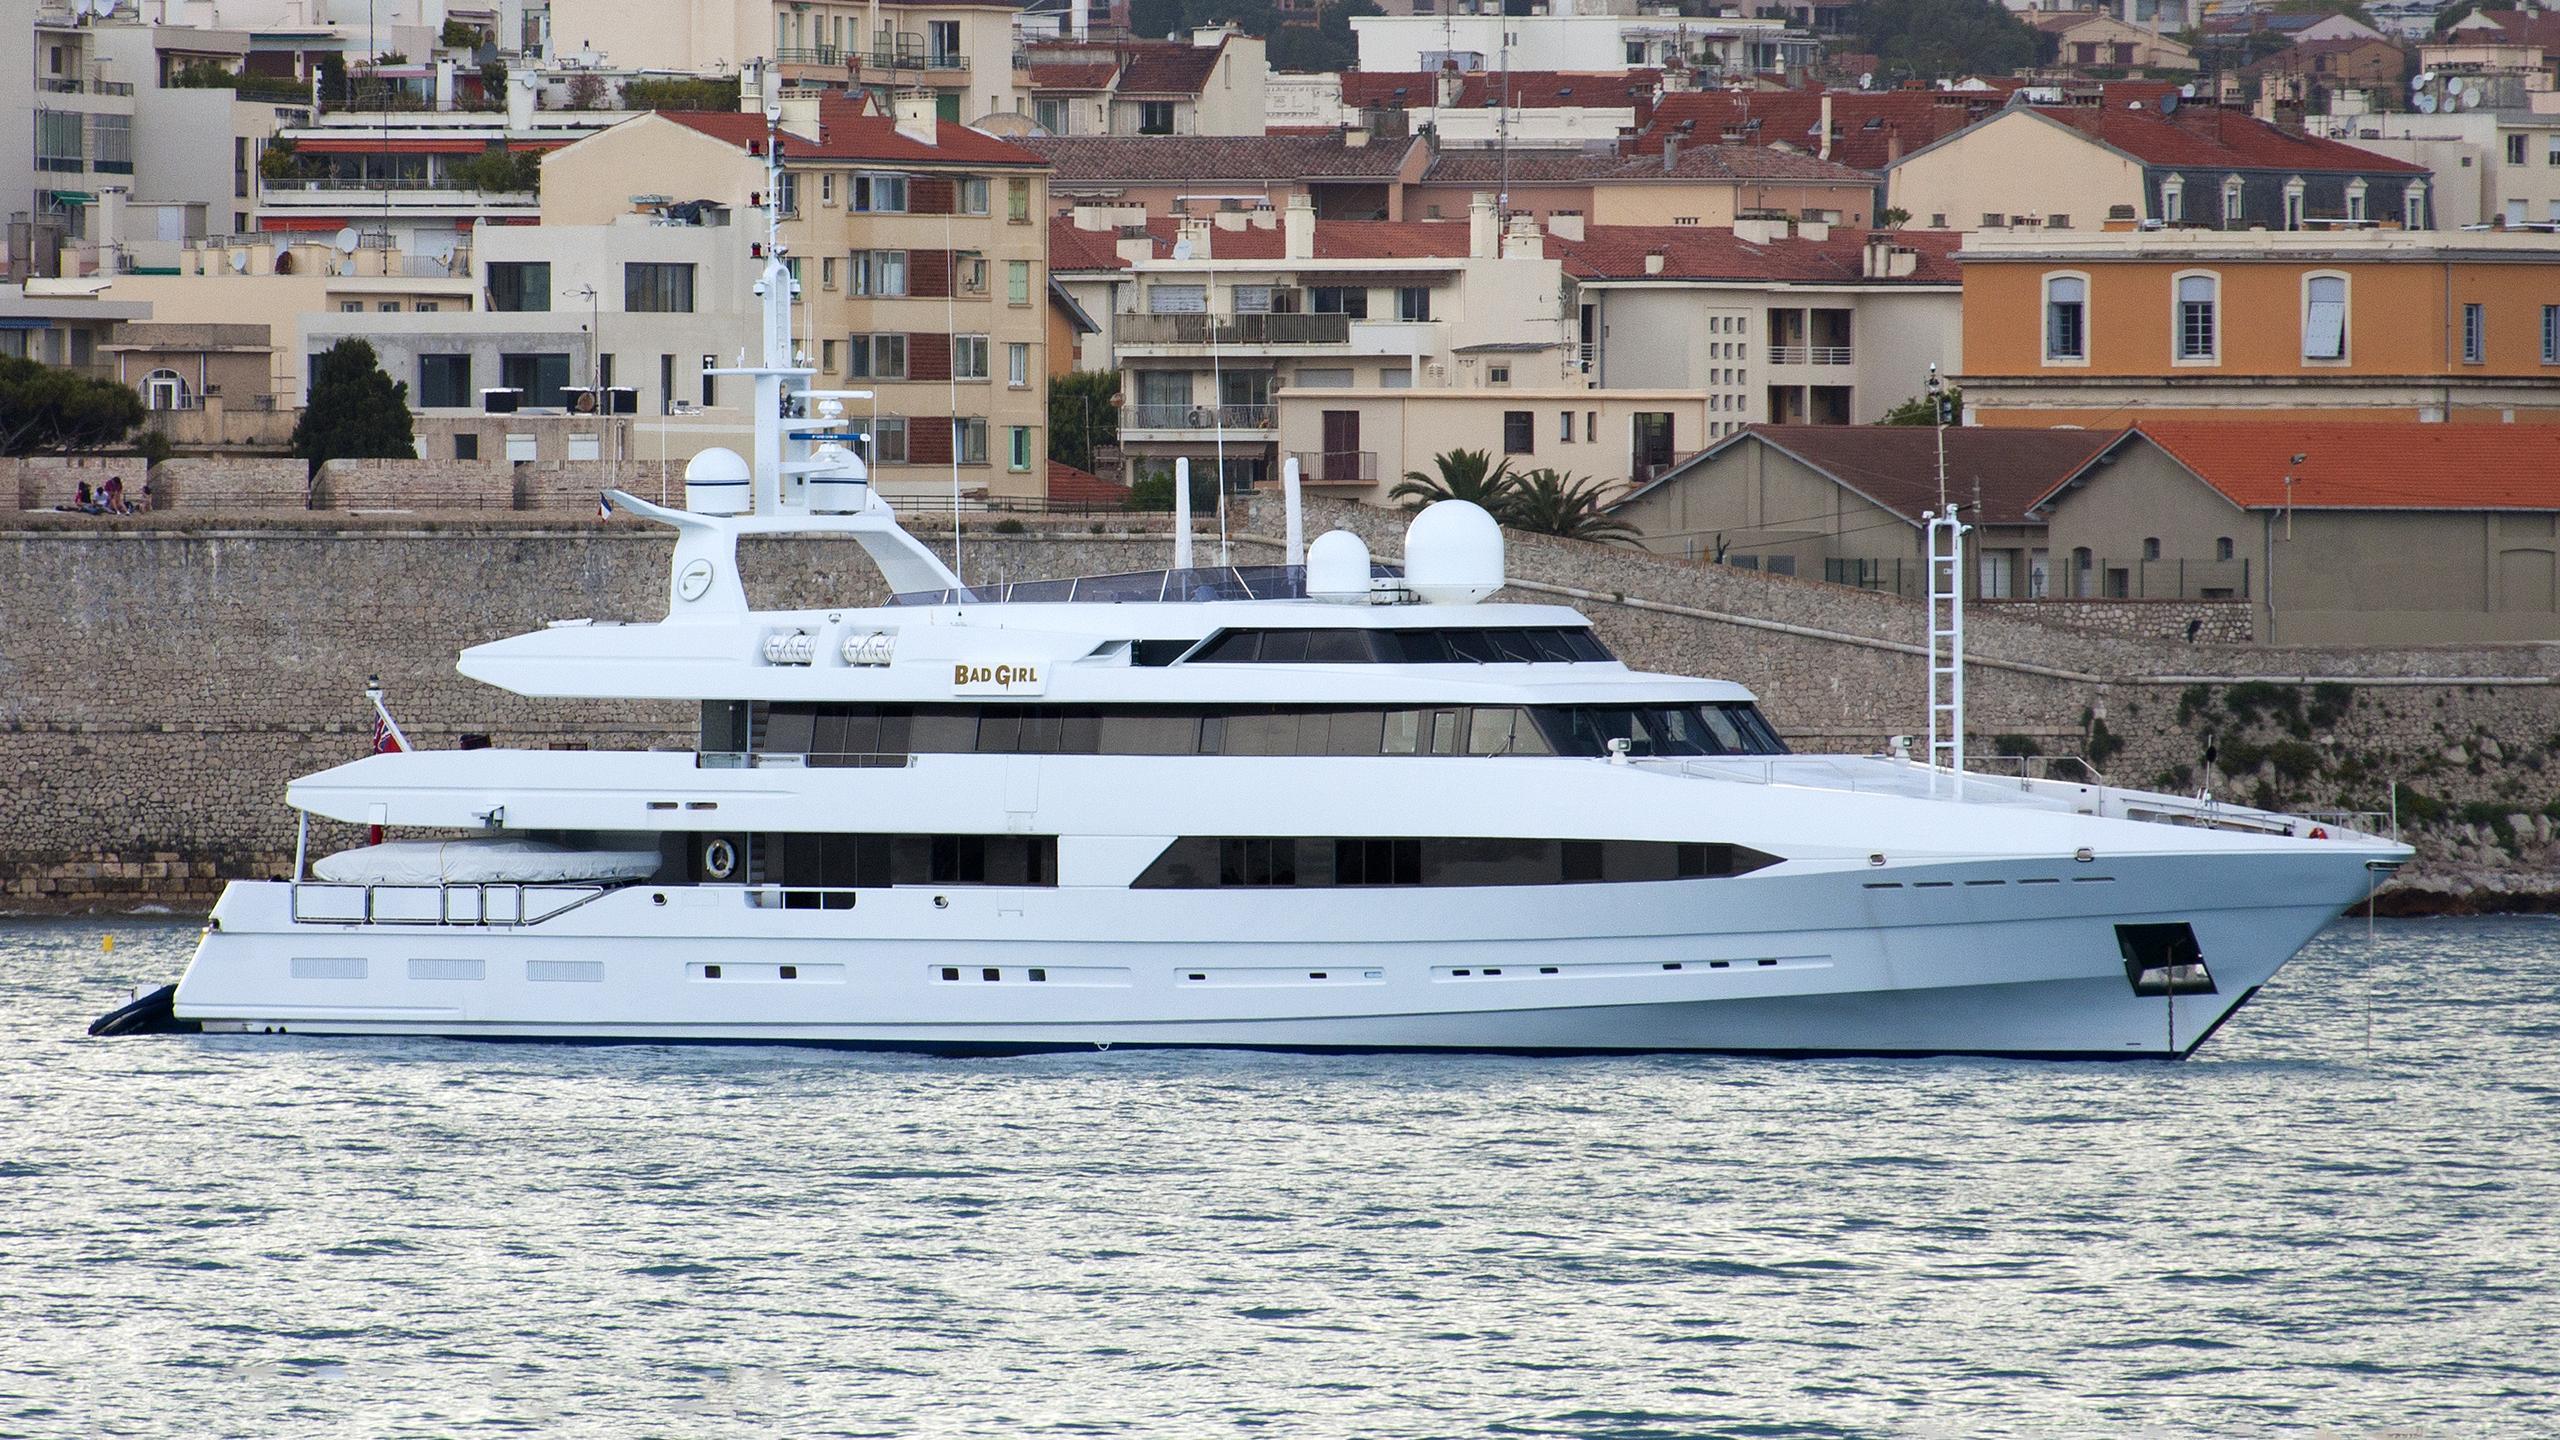 bad-girl-yacht-exterior